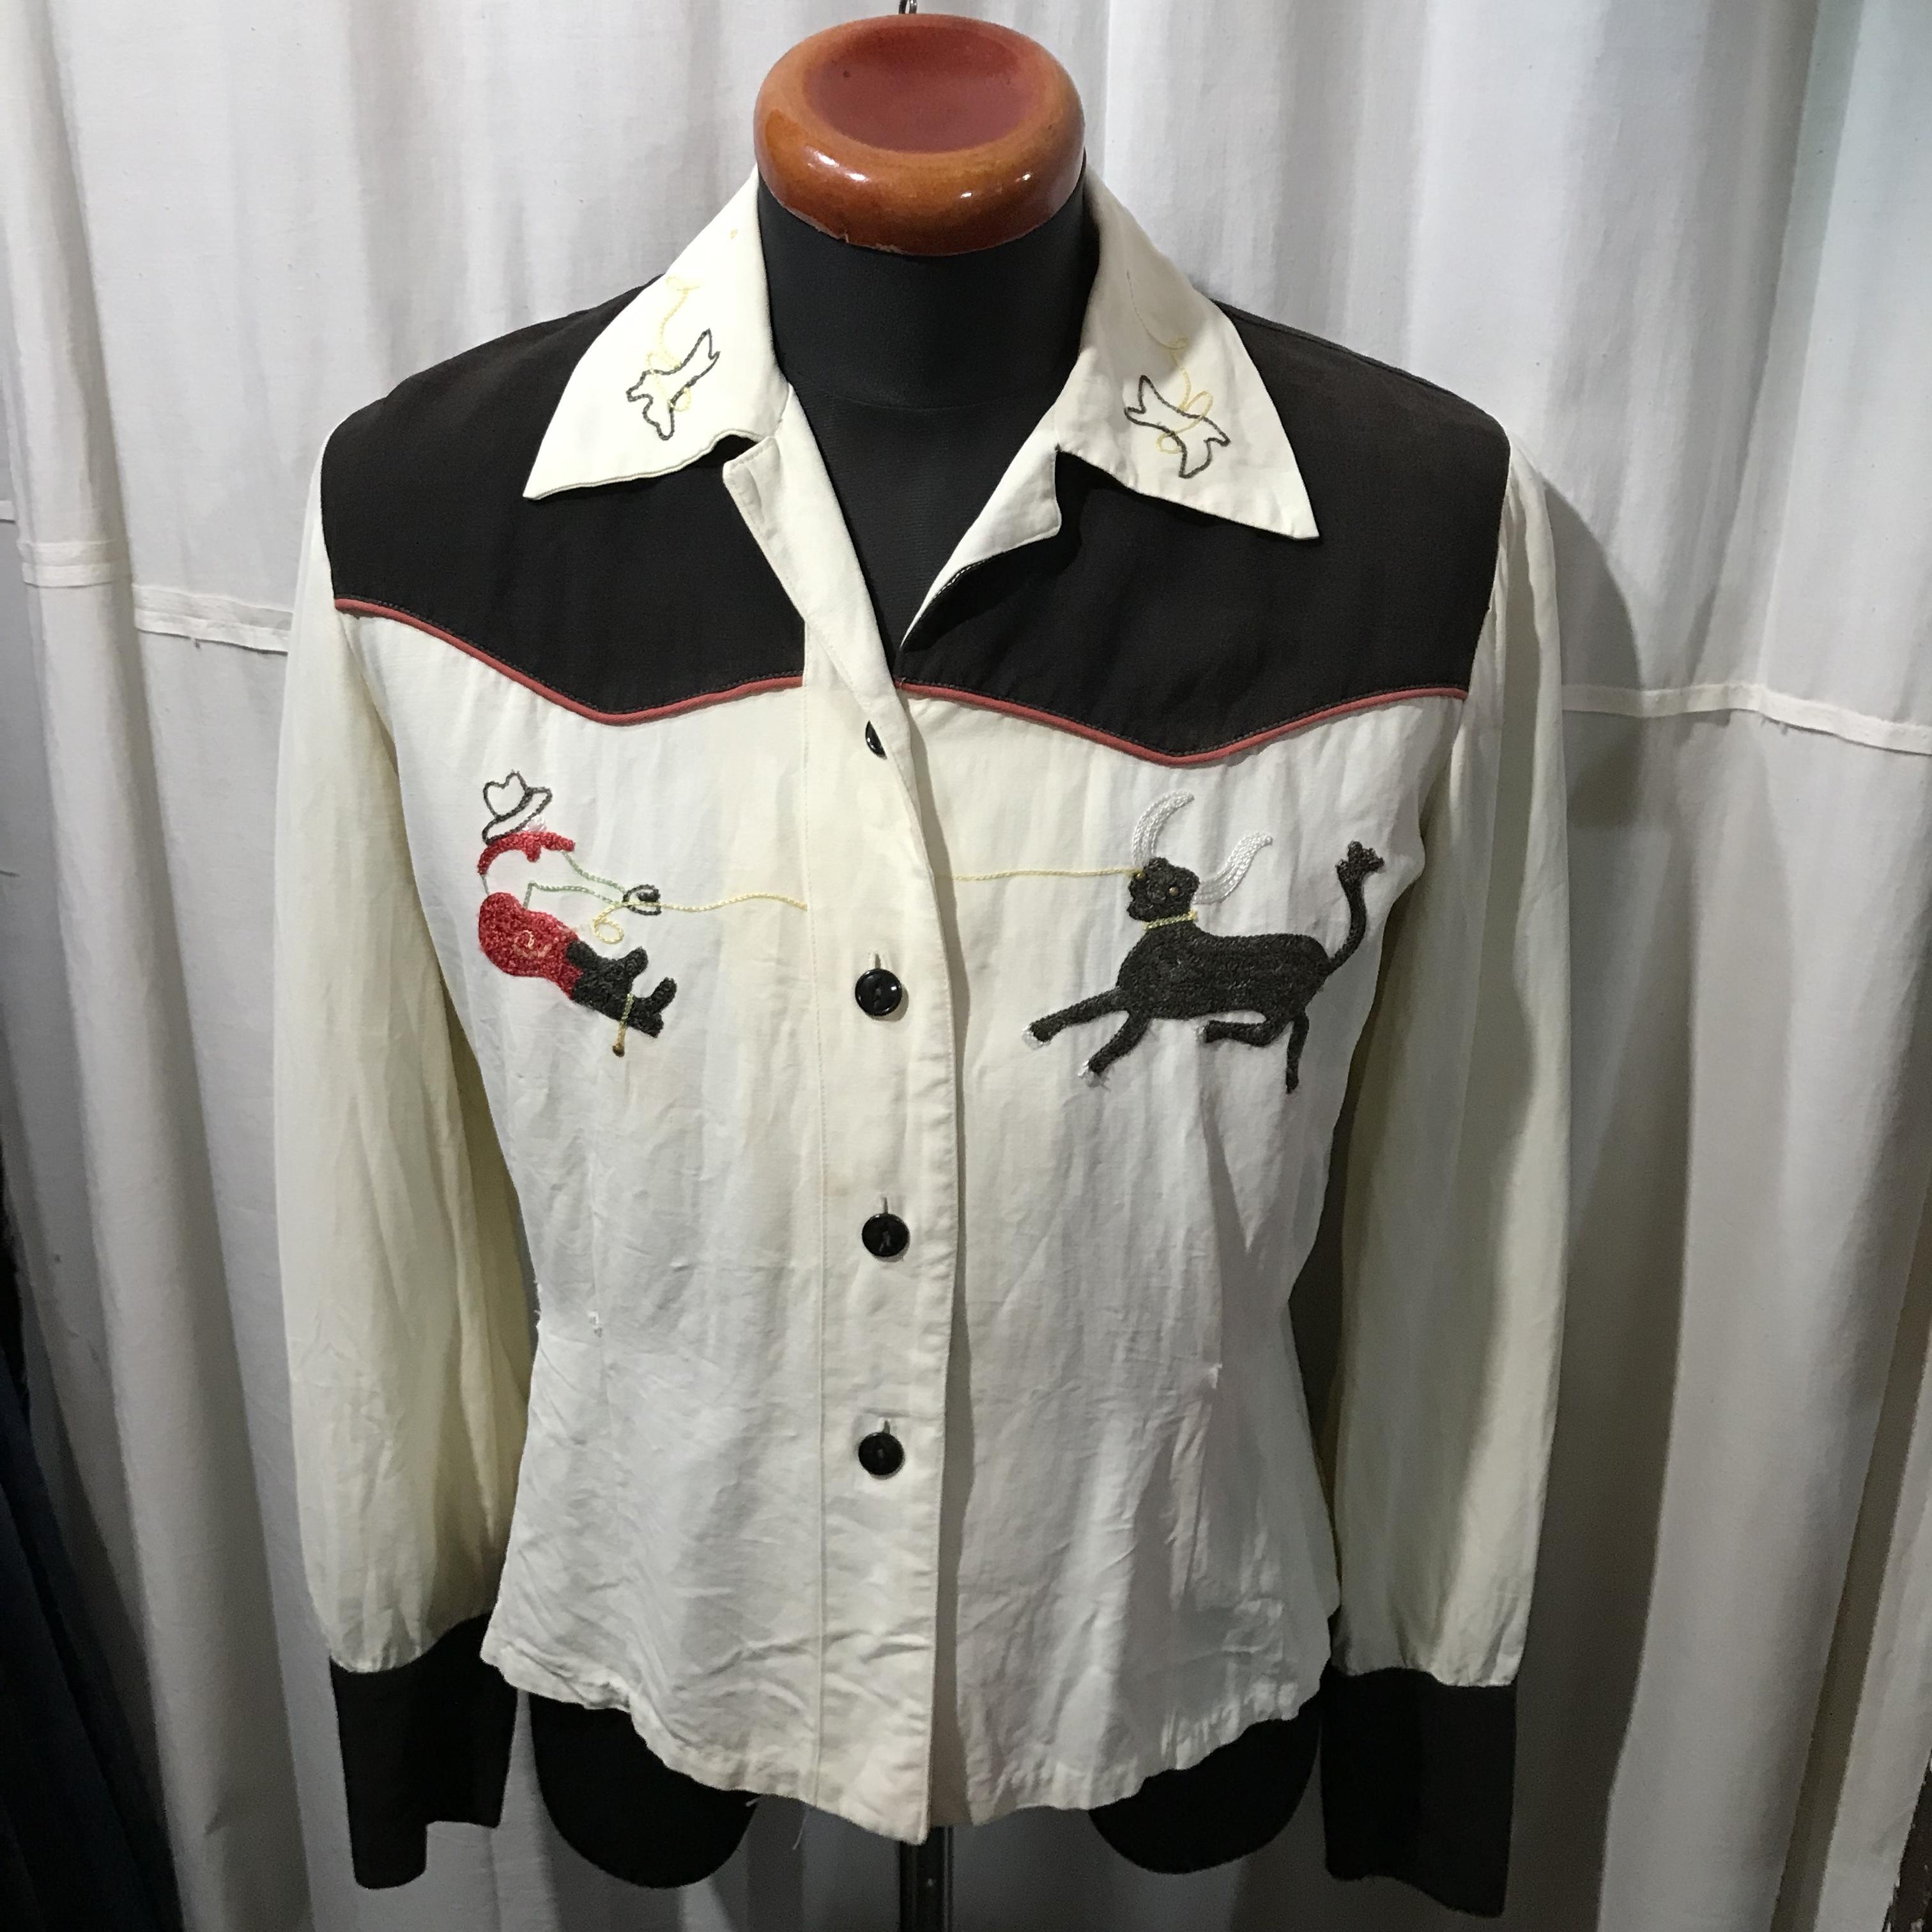 unknown レディースオープンカラーシャツ 刺繍 メンズS